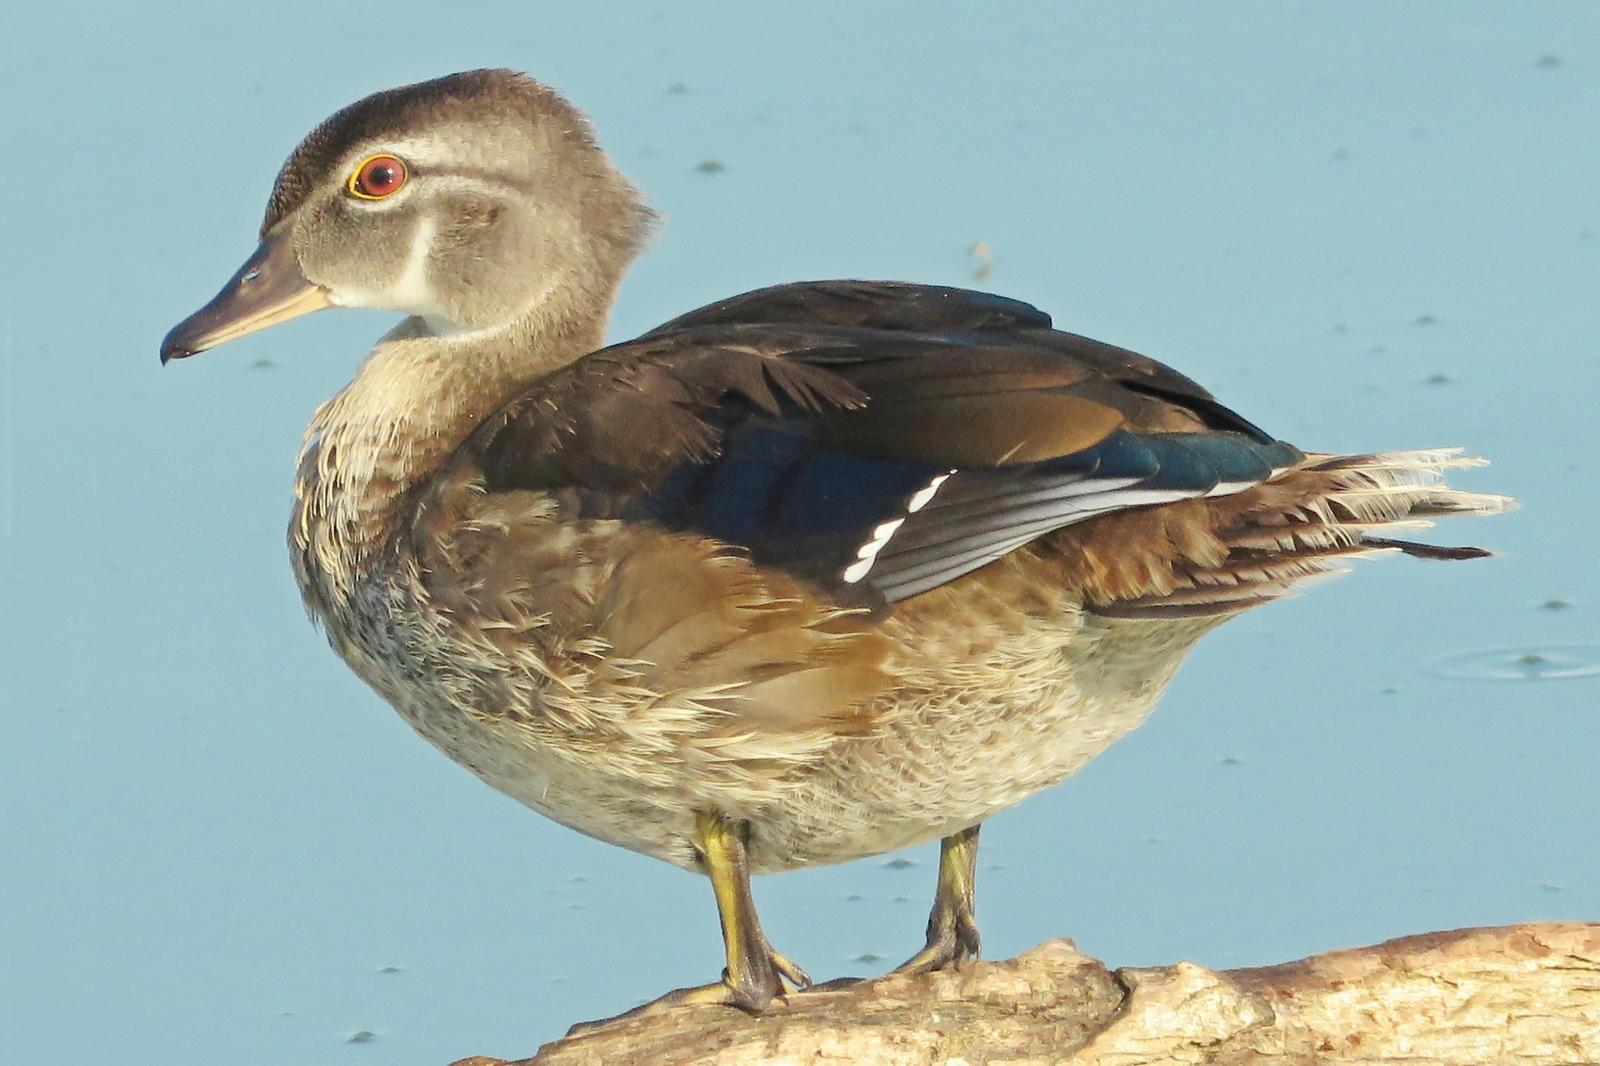 Wood Duck Photo by Bob Neugebauer